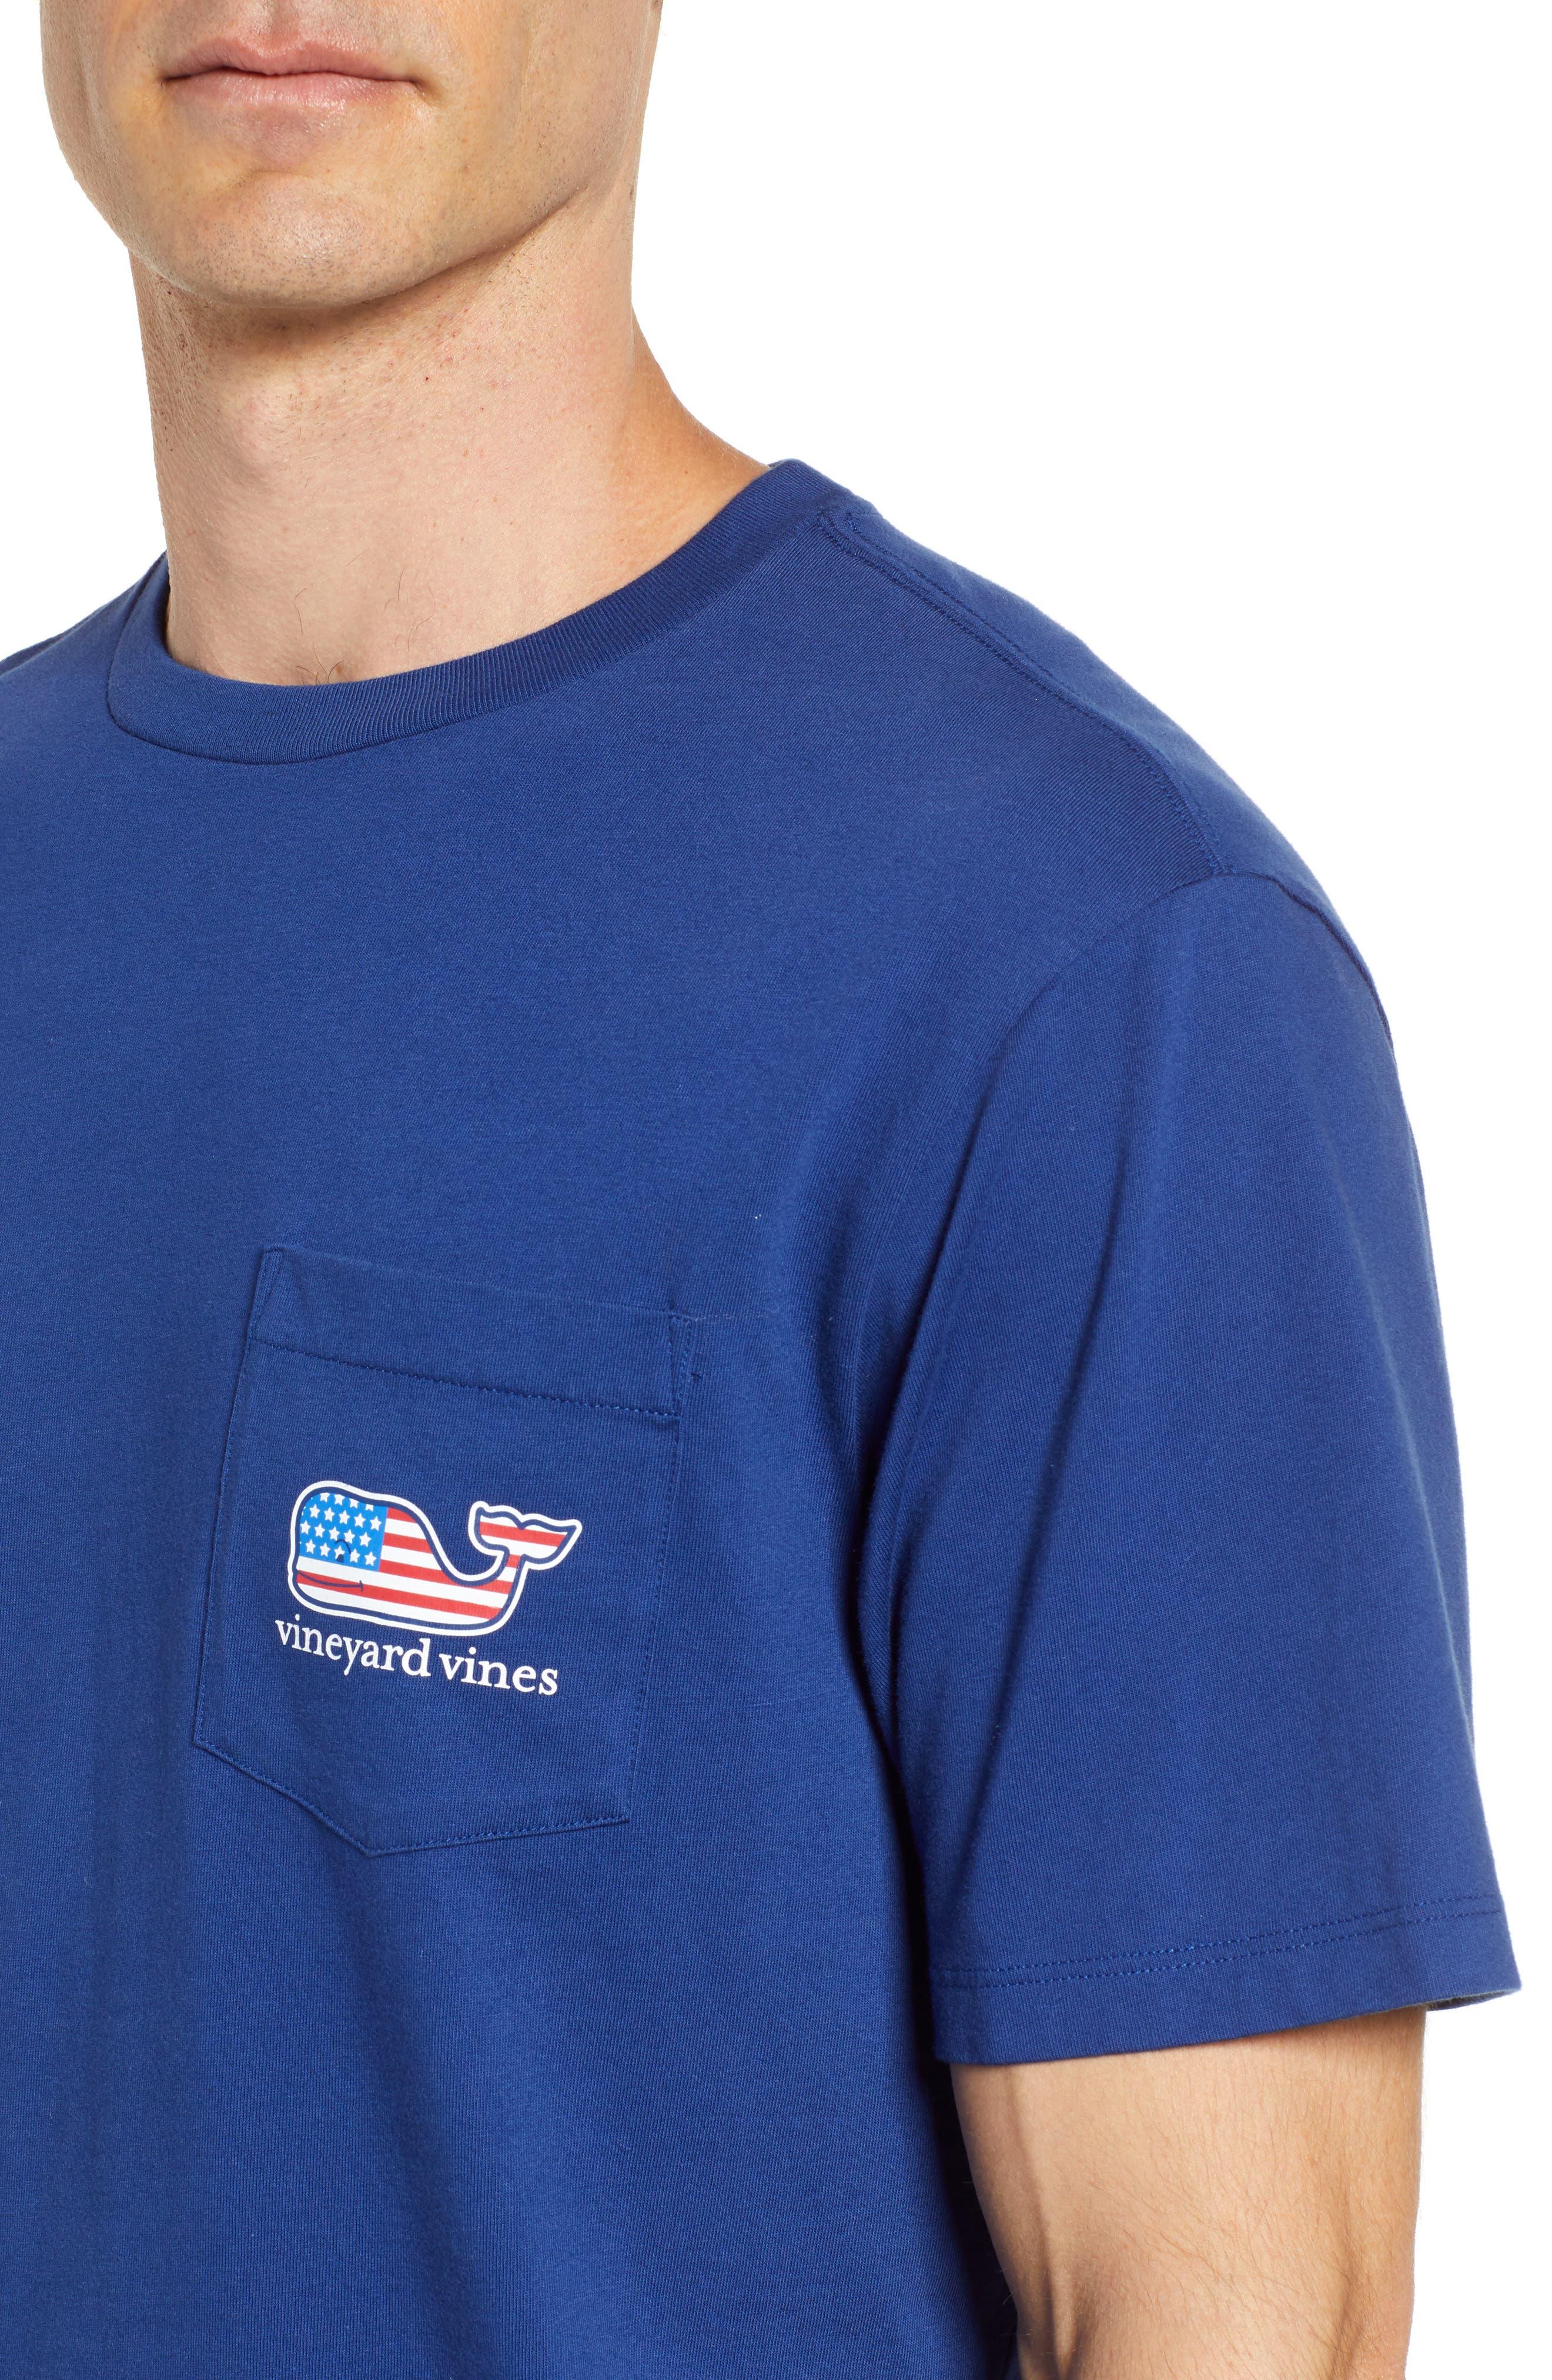 U.S. Tradition Pocket T-Shirt,                             Alternate thumbnail 4, color,                             400